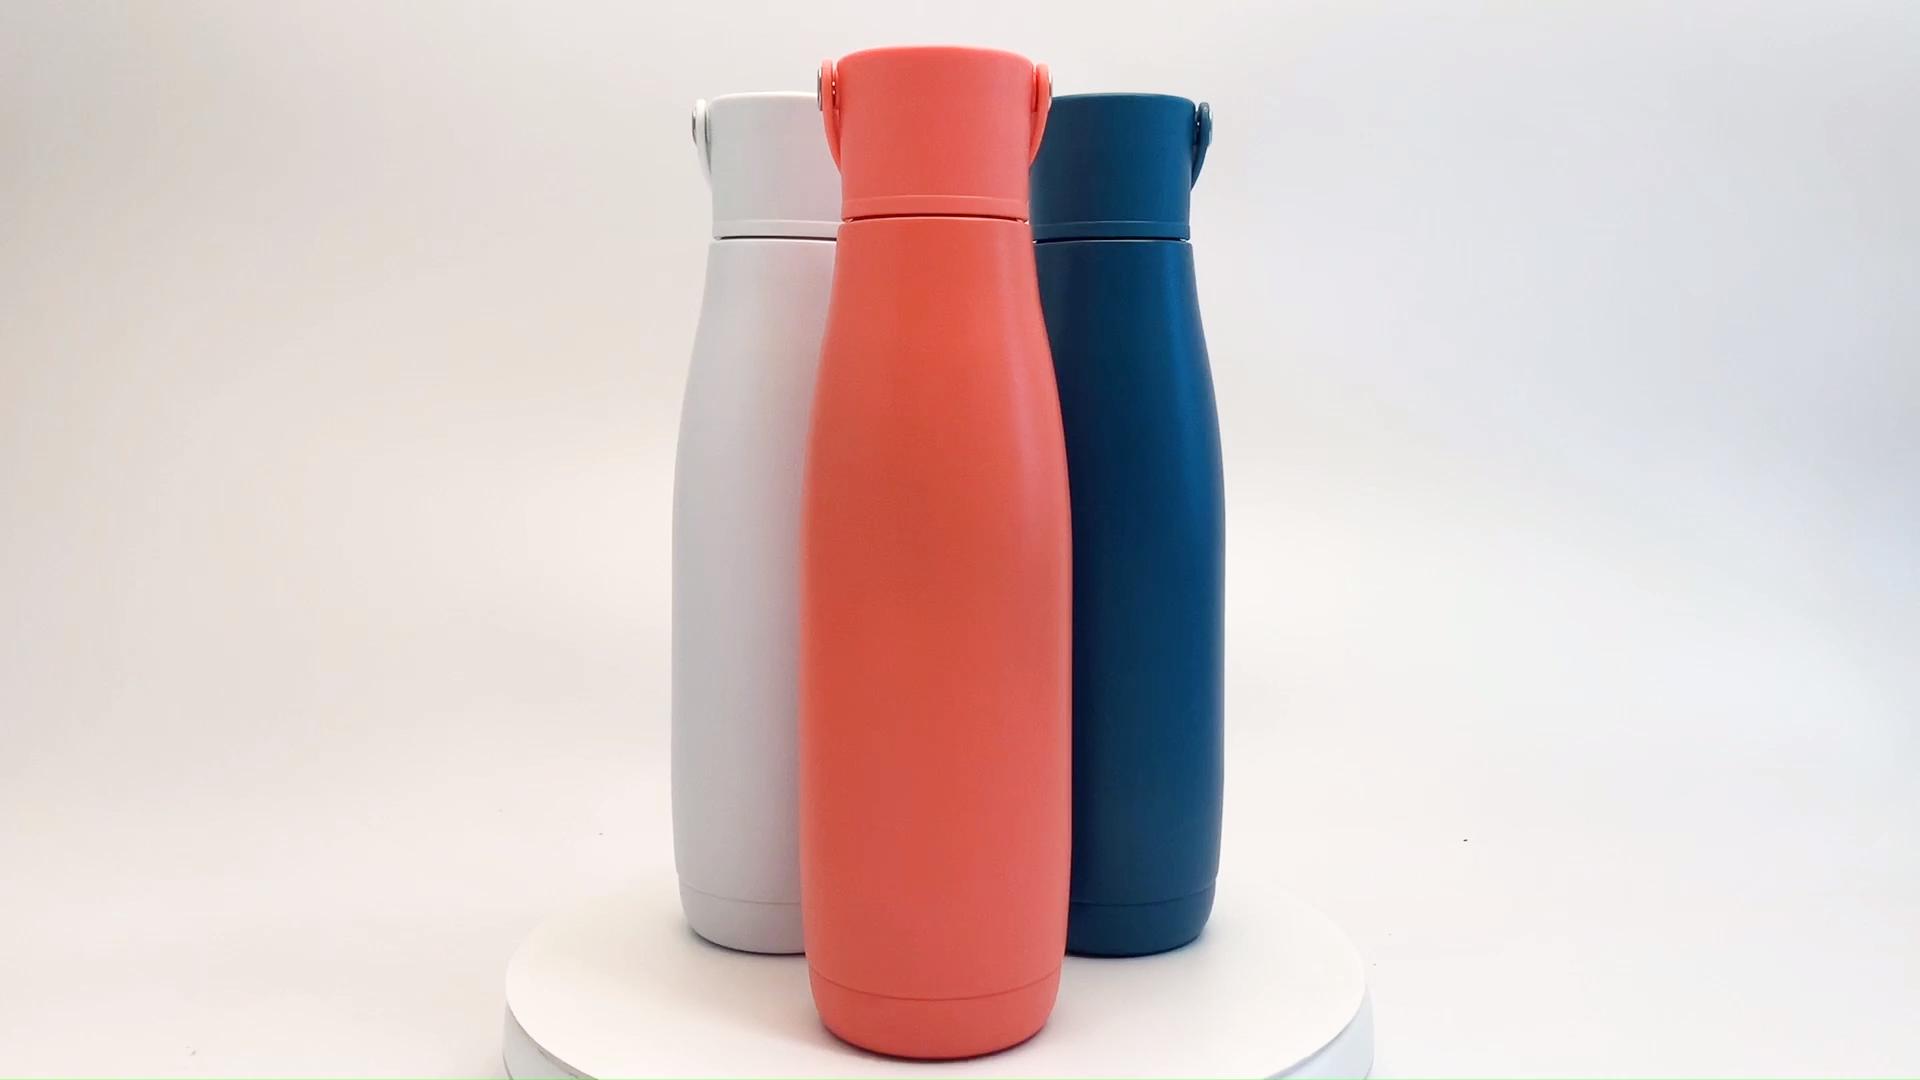 Leak Proof Powder Coating Triple Wall Vacuum Flask Stainless Steel Insulated Water Bottle